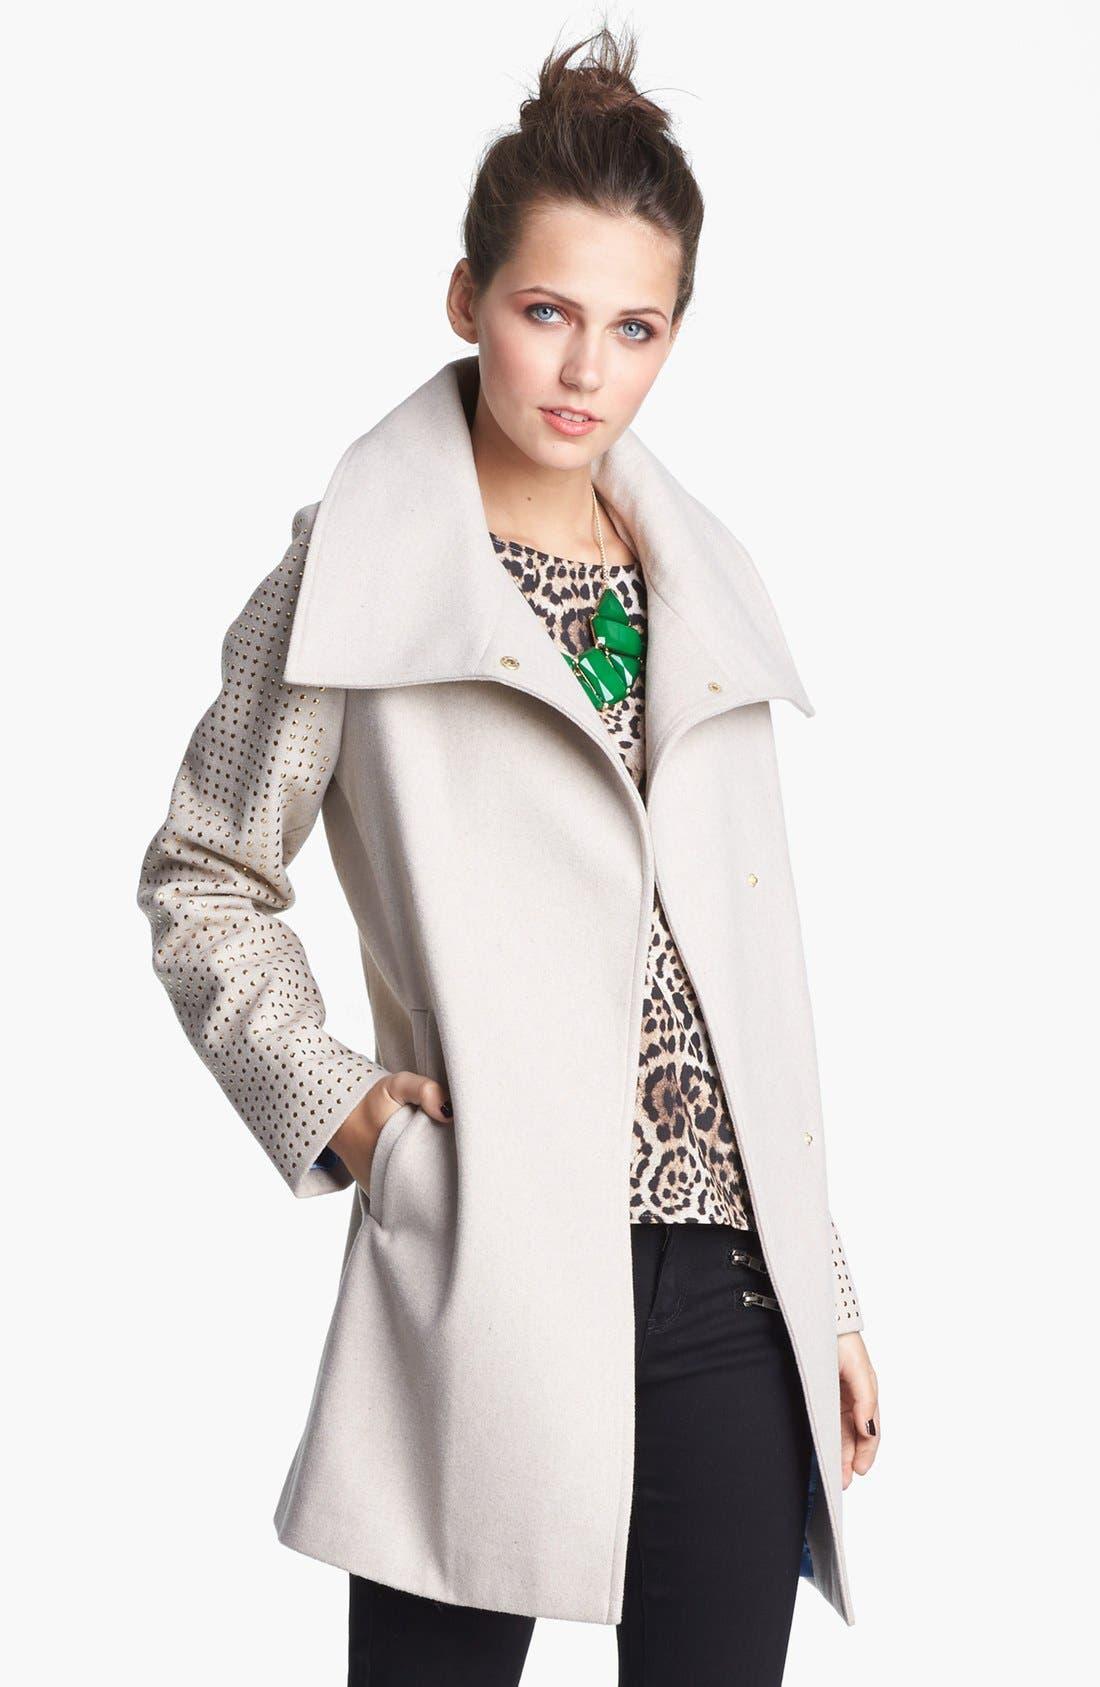 Alternate Image 1 Selected - Jou Jou Studded Coat (Juniors)